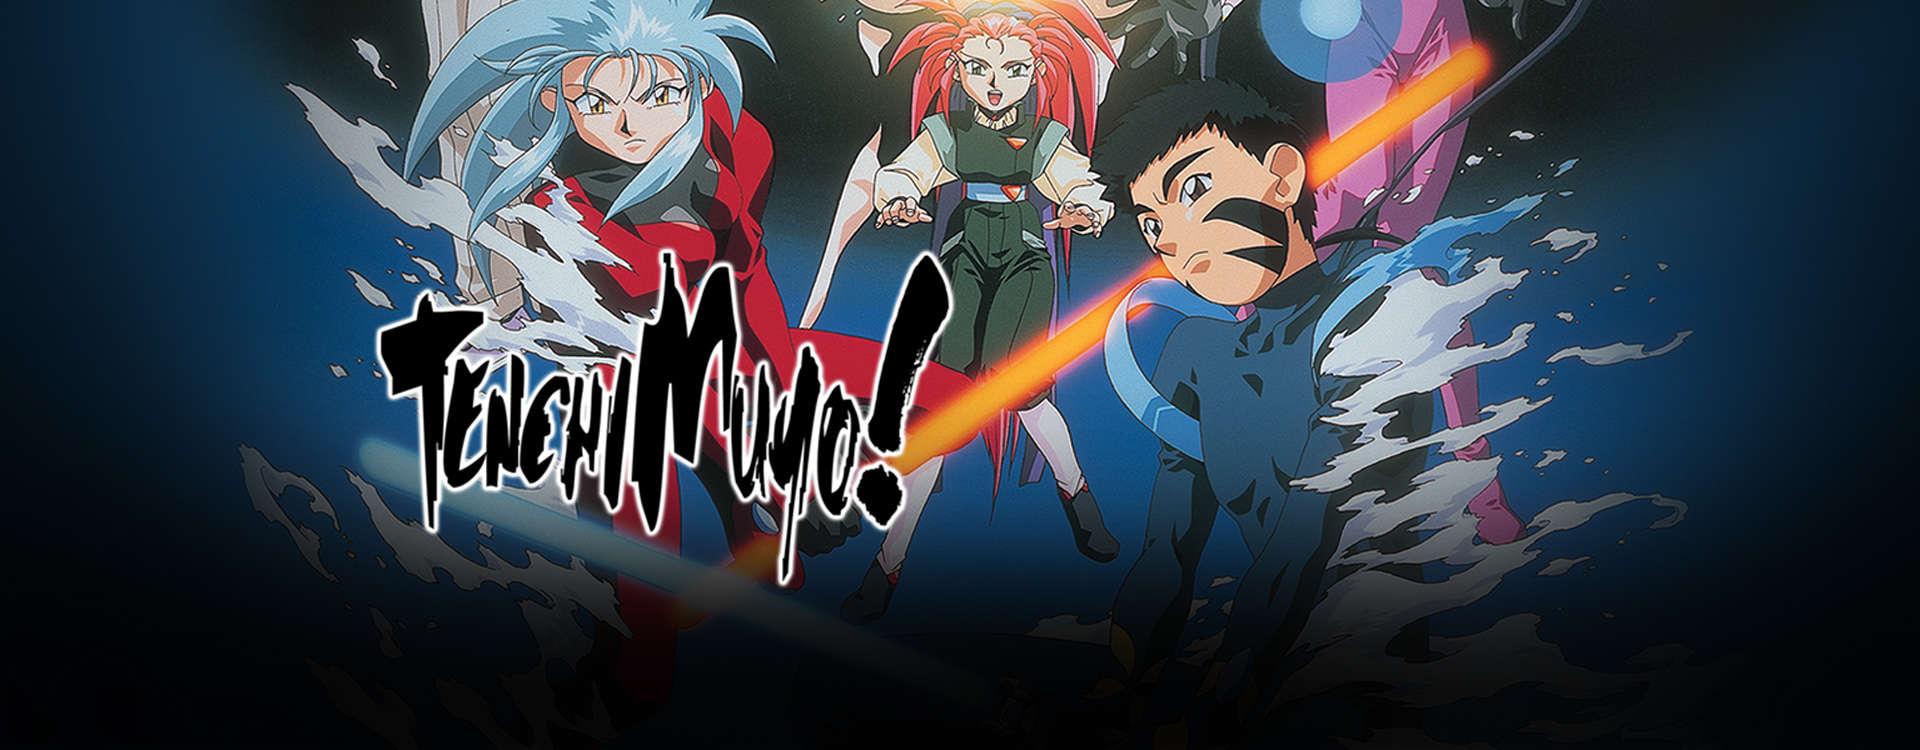 Tenchi Muyo! Movies